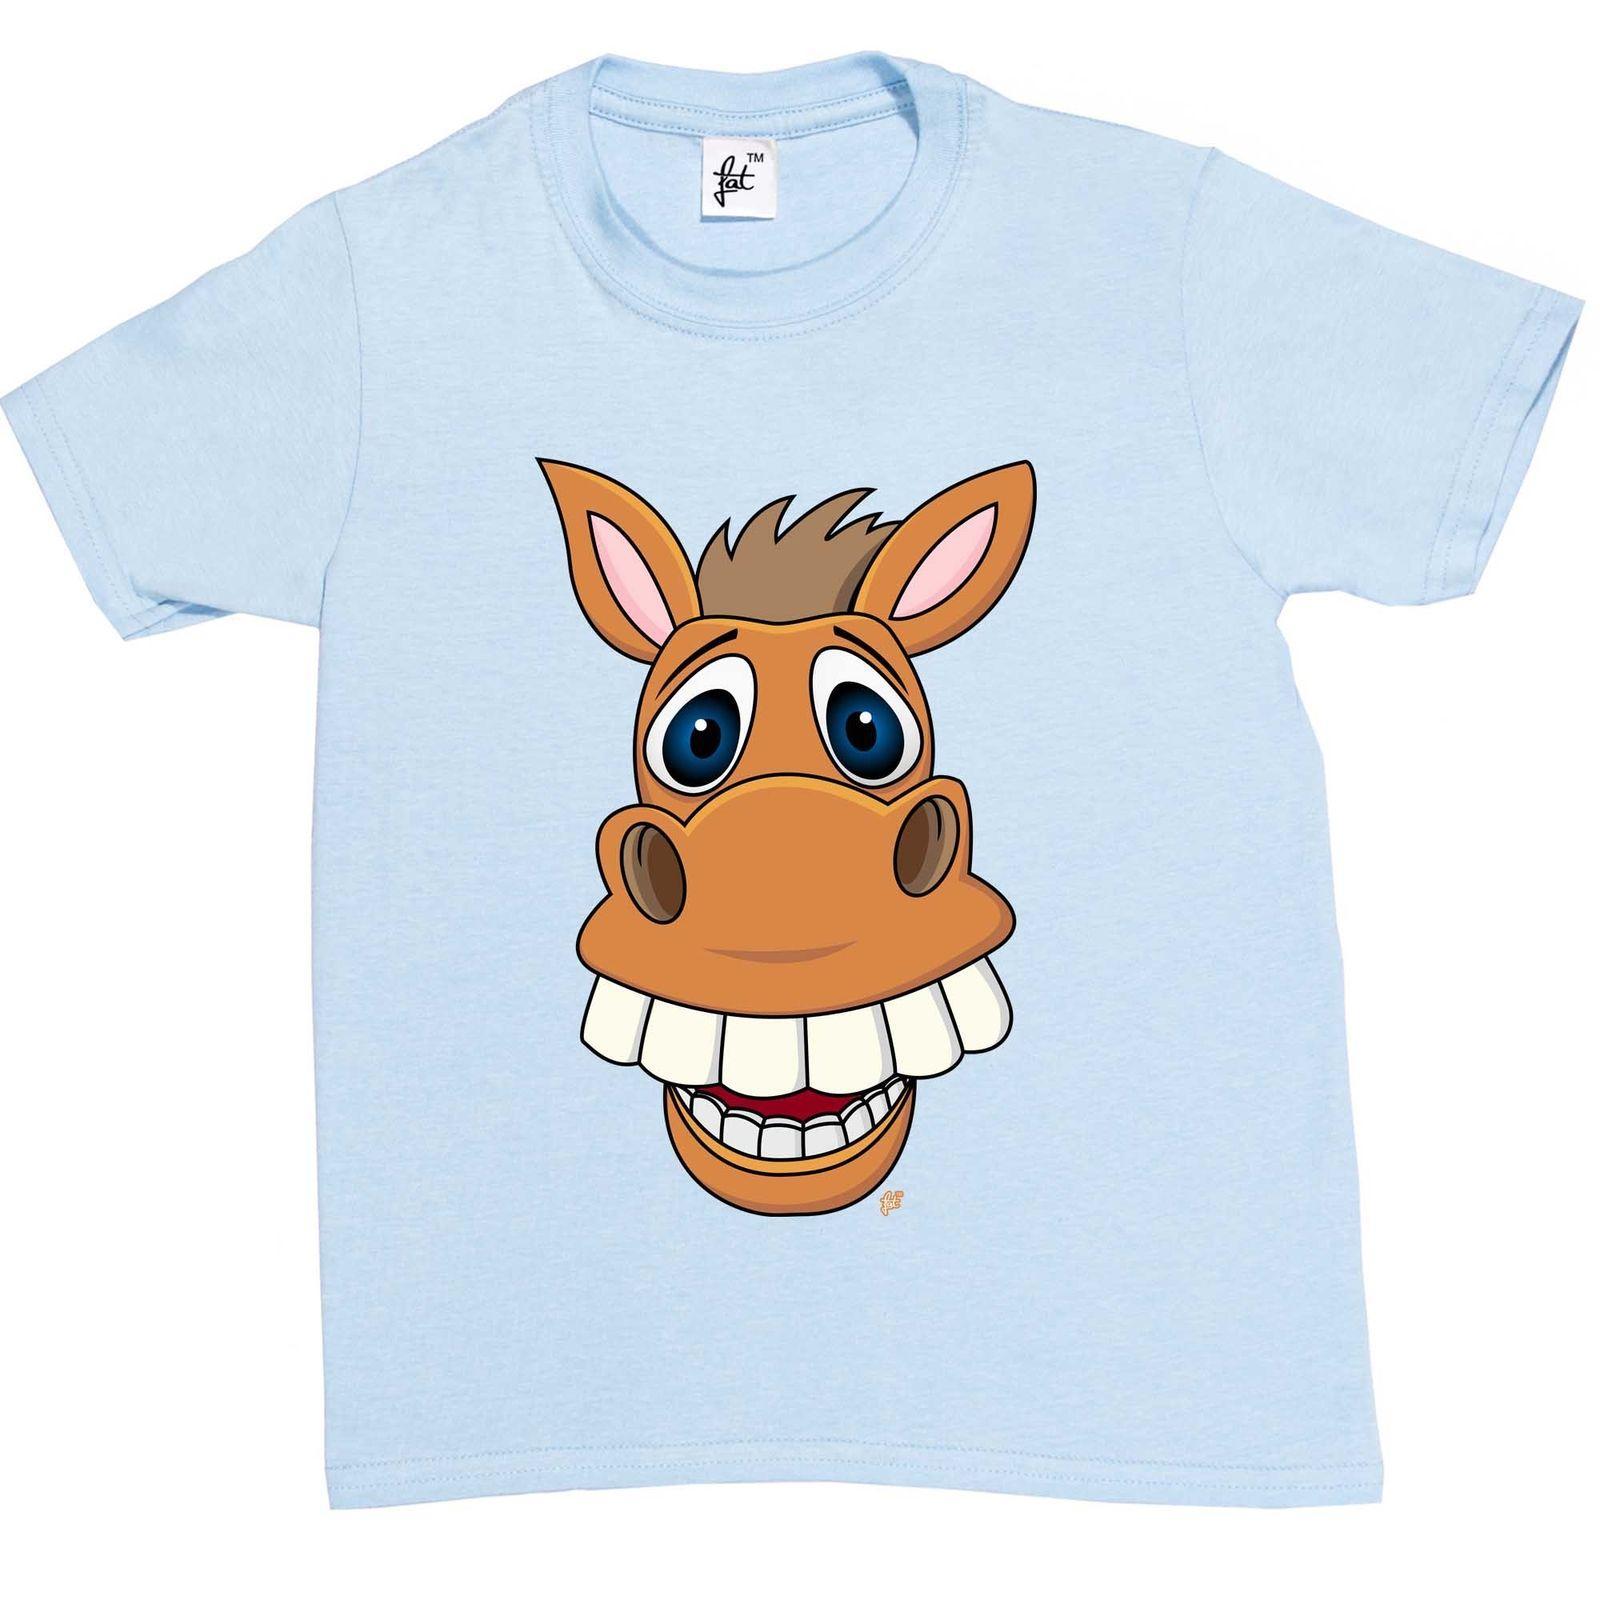 ce06cbfc7 Close Up Funny Looking Big Teeth T Shirt Jersey Print T Shirt Brand Shirts  Jeans Print Classic Quality High T Shirt Funny T Shirt Sites Crazy T Shirt  ...